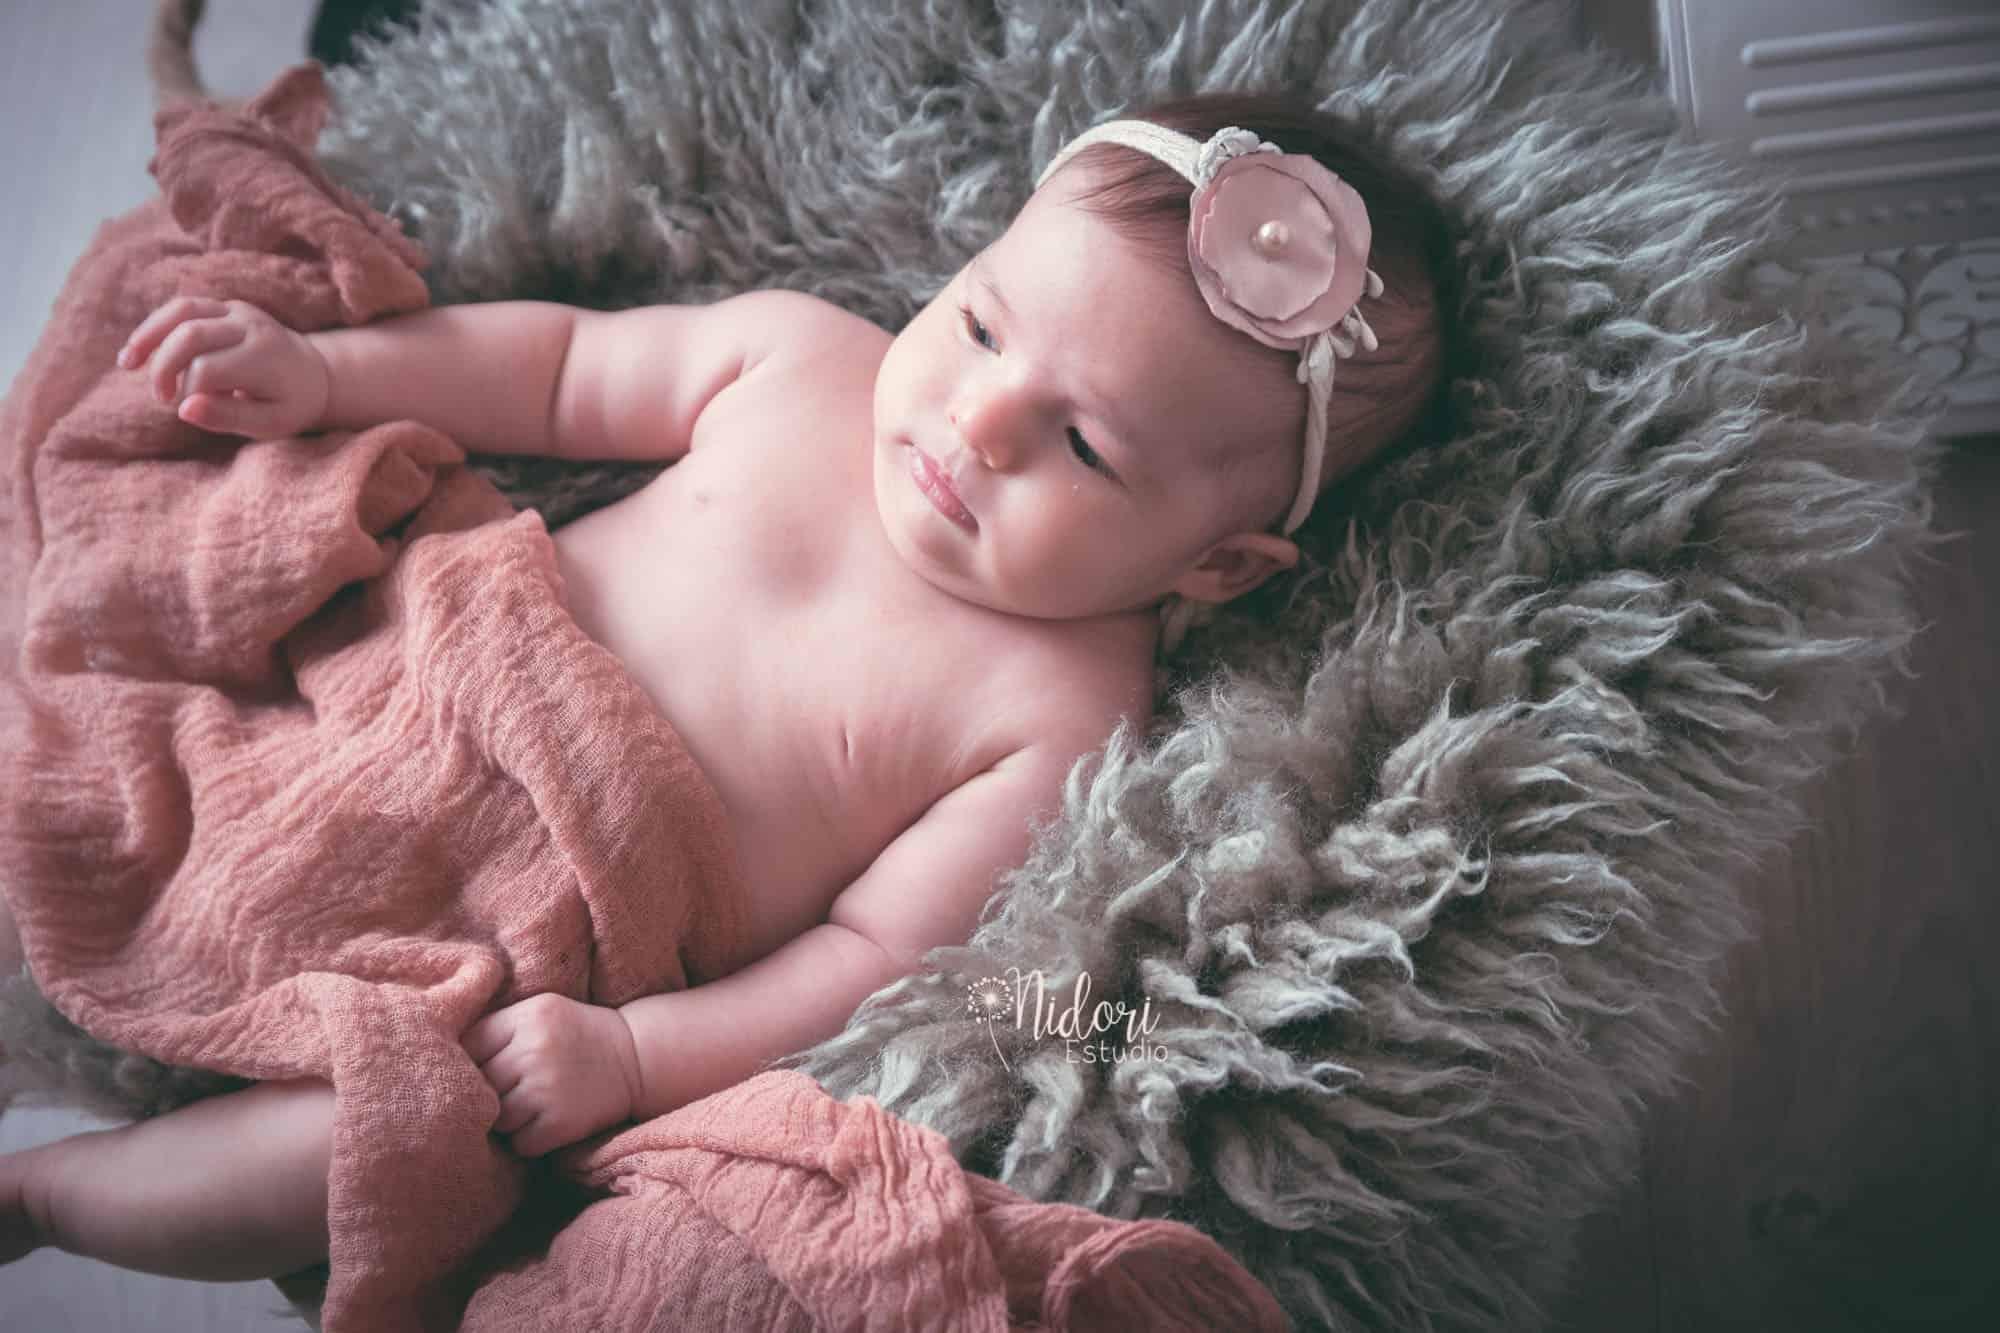 seguimiento-fotografia-niños-bebes-nidoriestudio-fotos-valencia-almazora-castellon-españa-spain-12